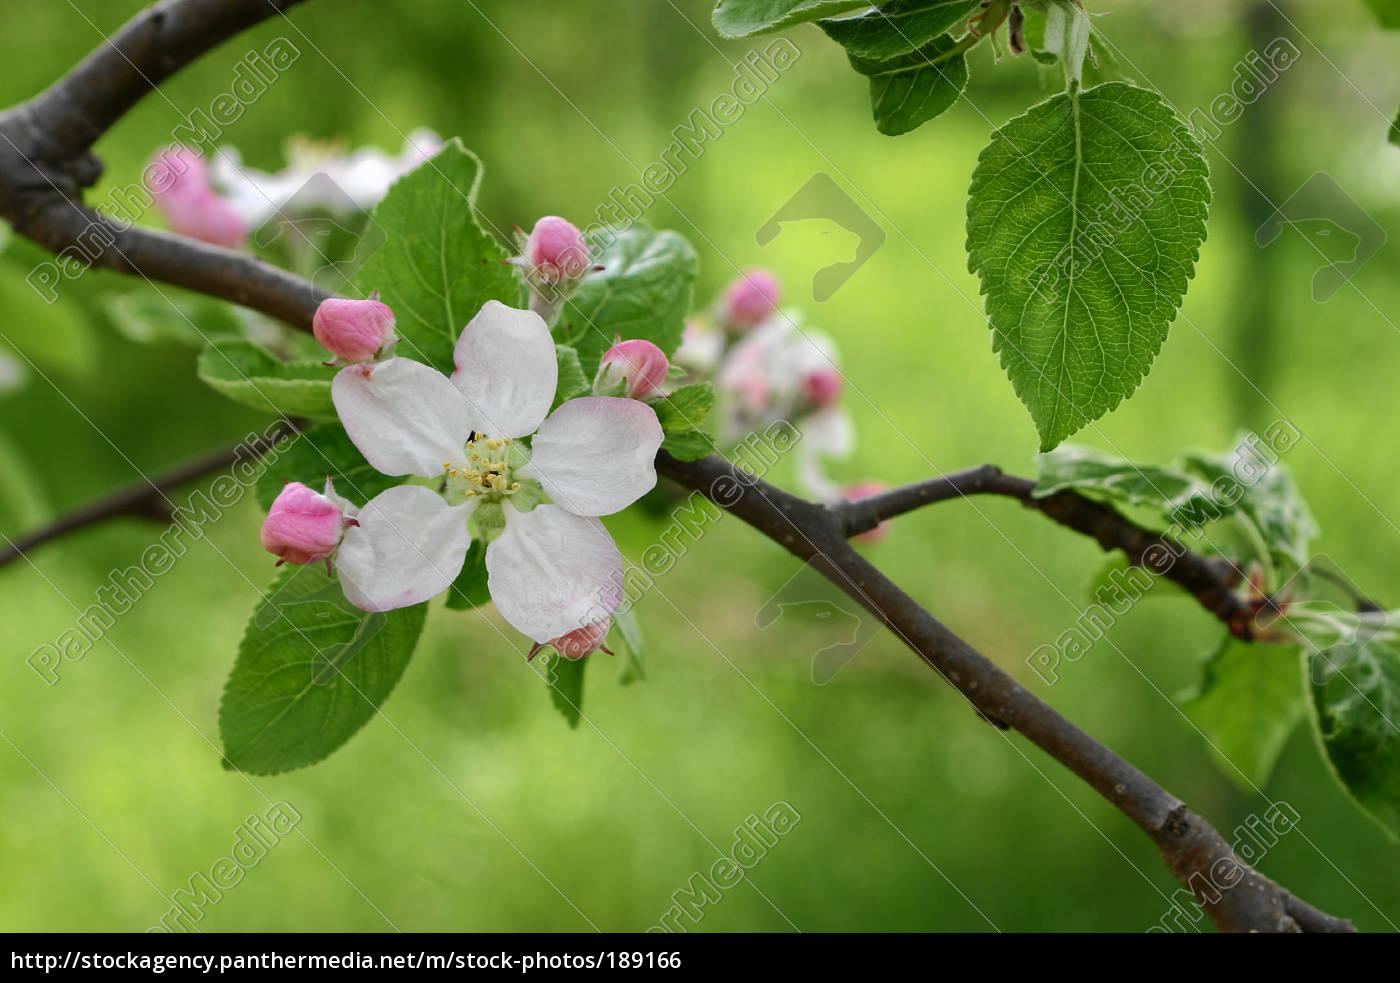 apple, blossom - 189166